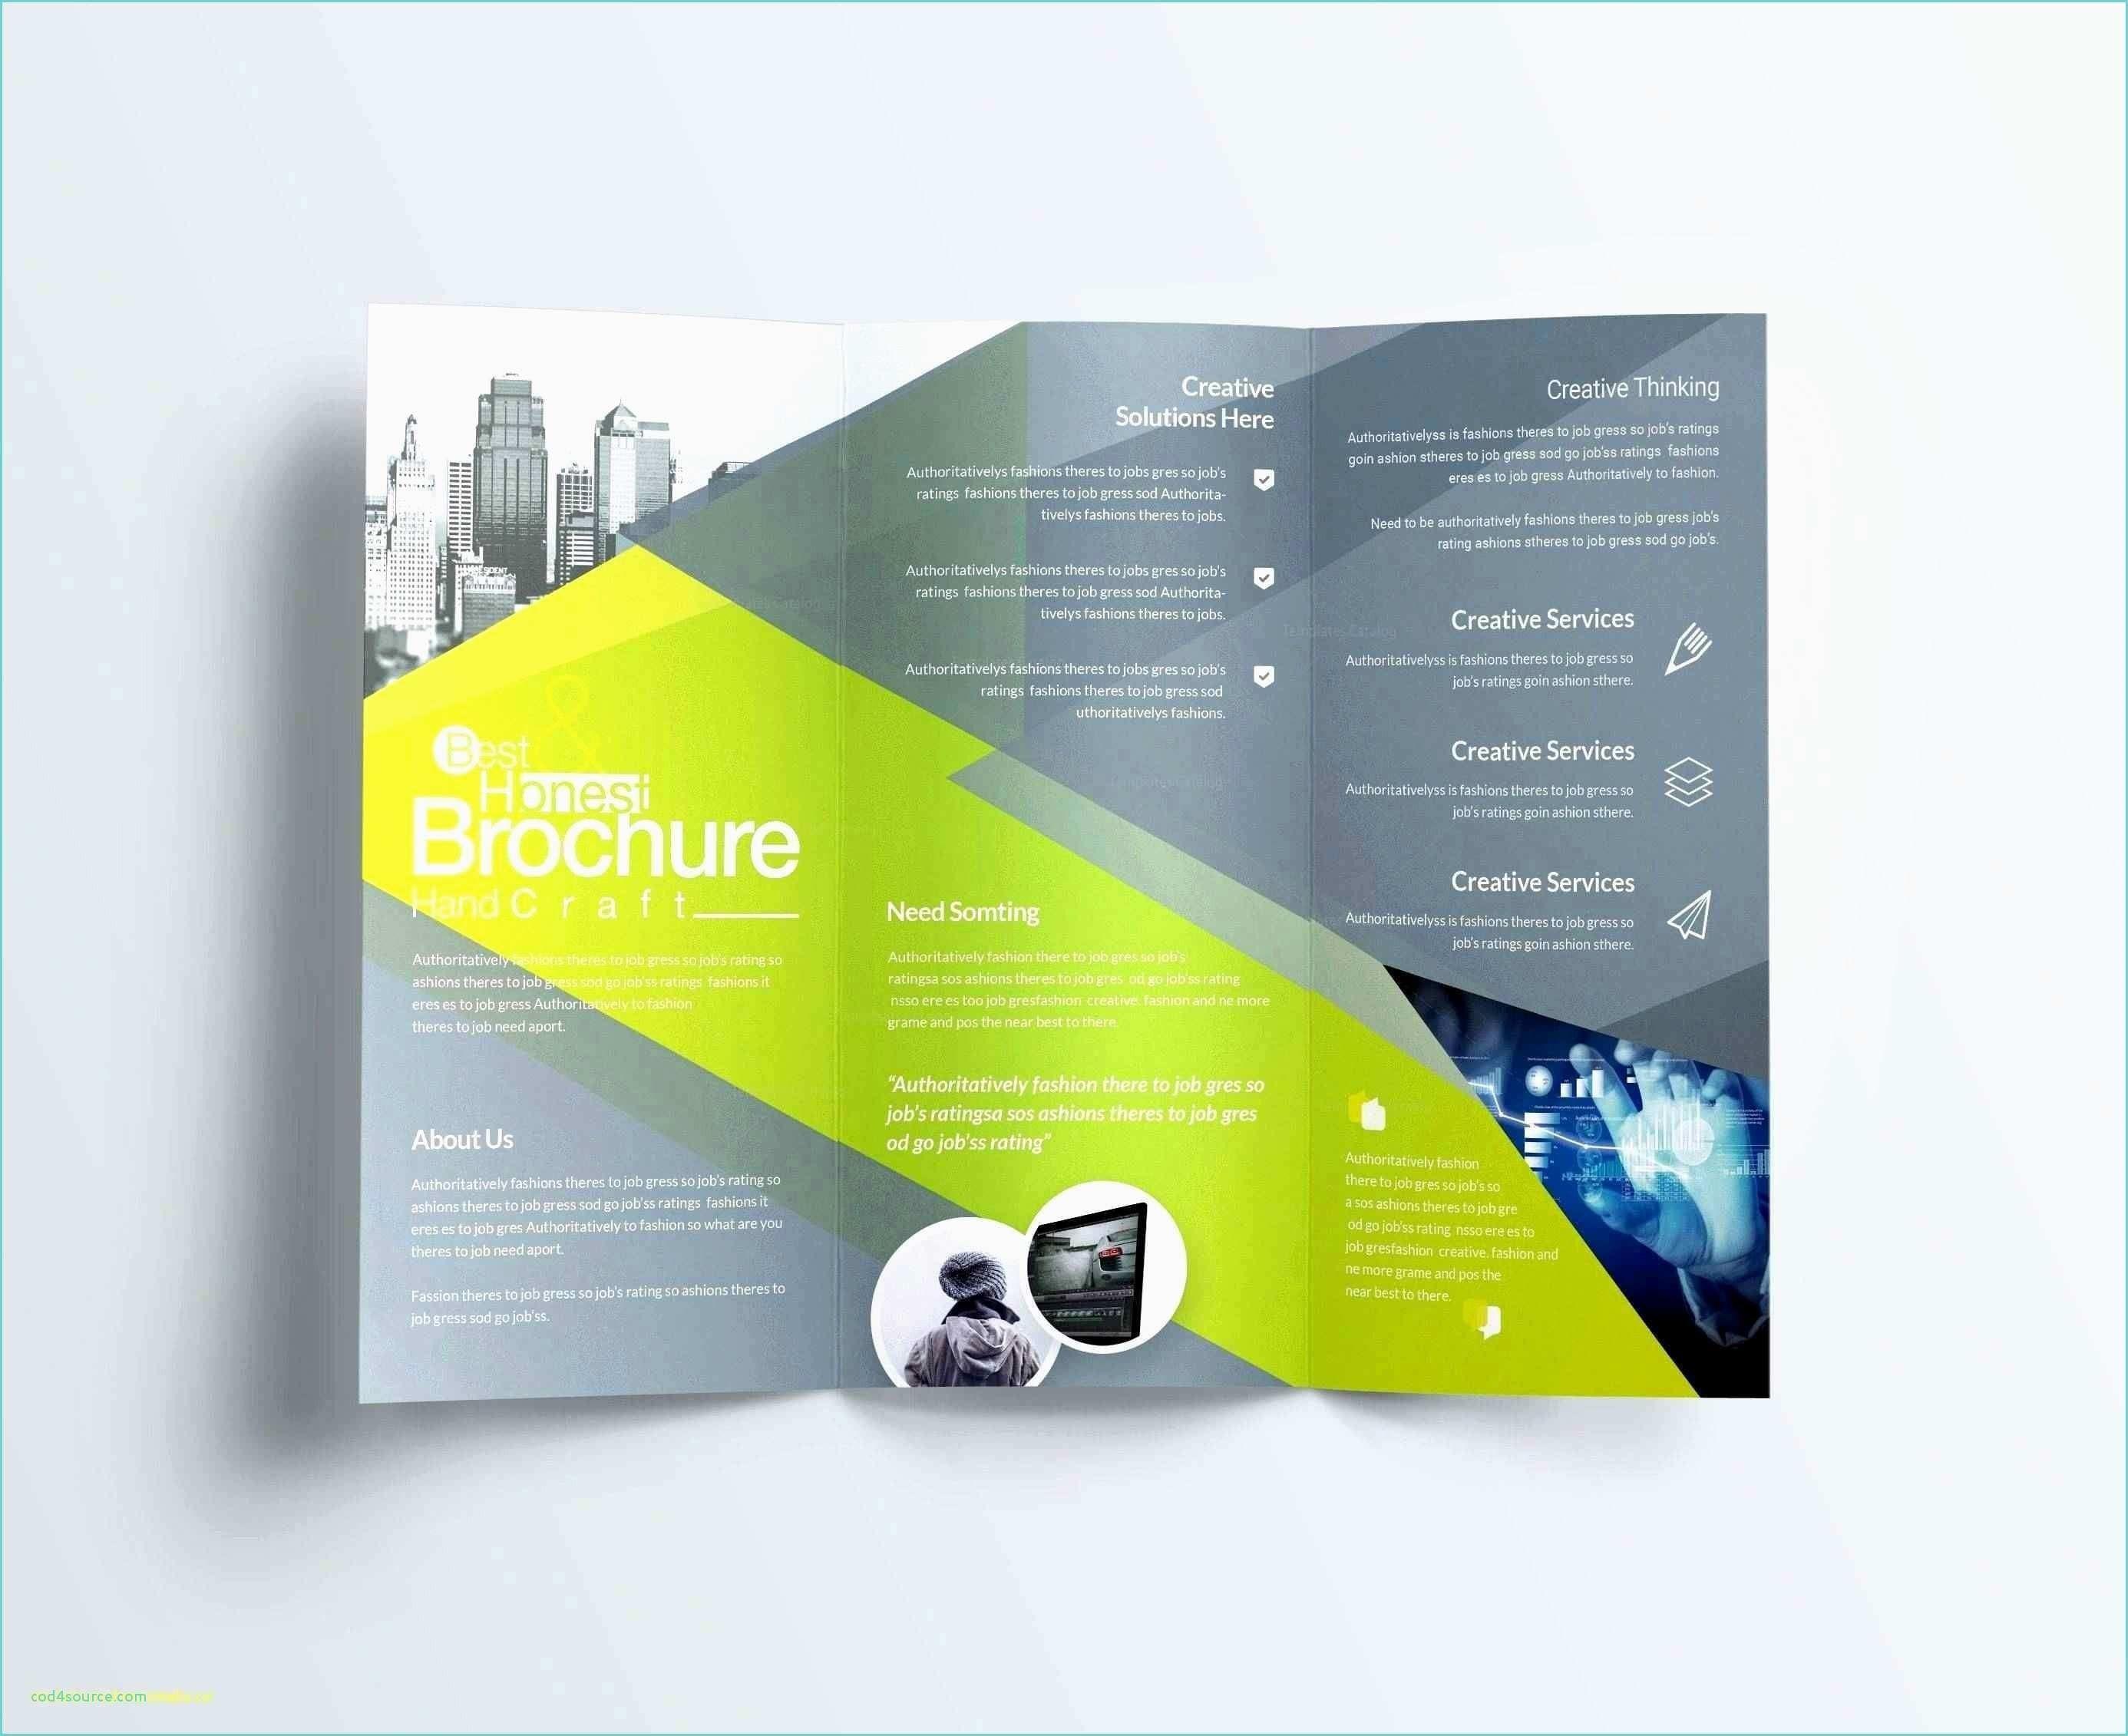 004 Wondrou Brochure Template For Word Mac Inspiration  Tri Fold FreeFull